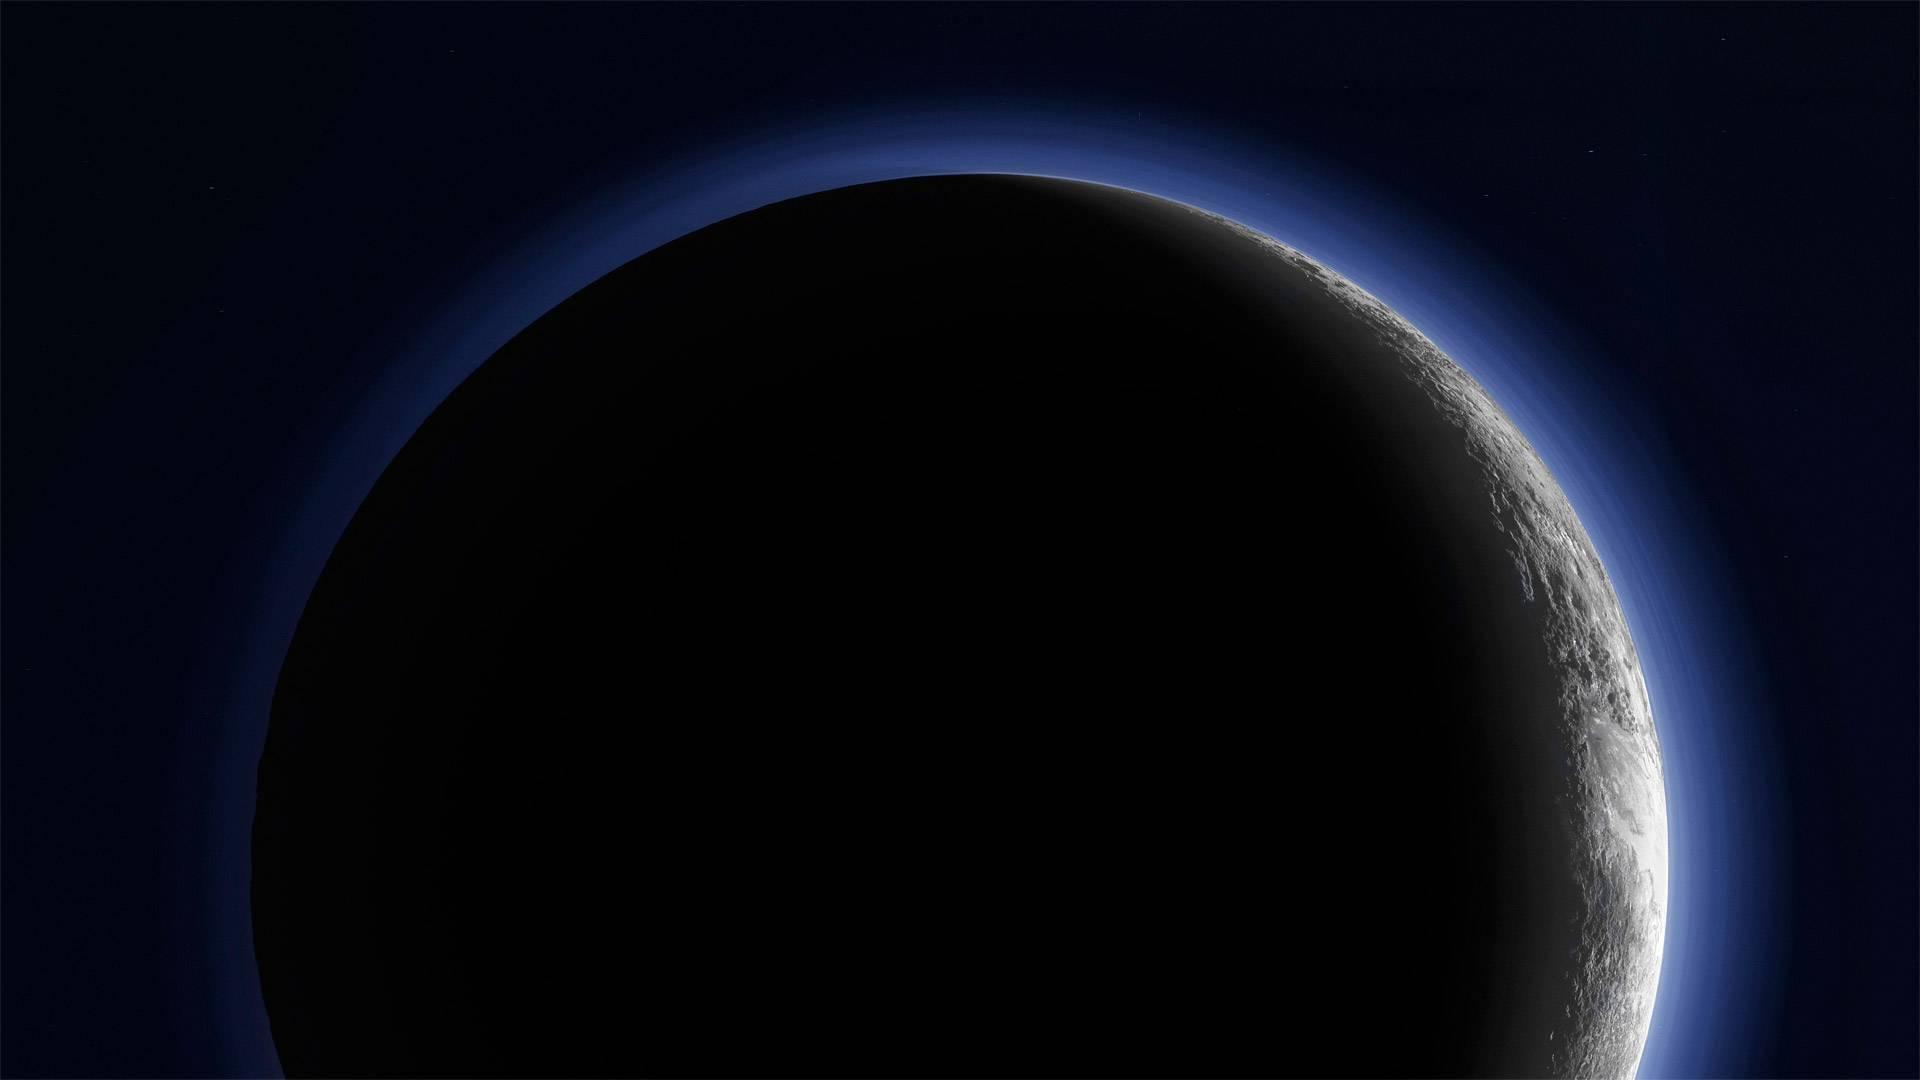 General 1920x1080 photography nature space Pluto NASA Bing